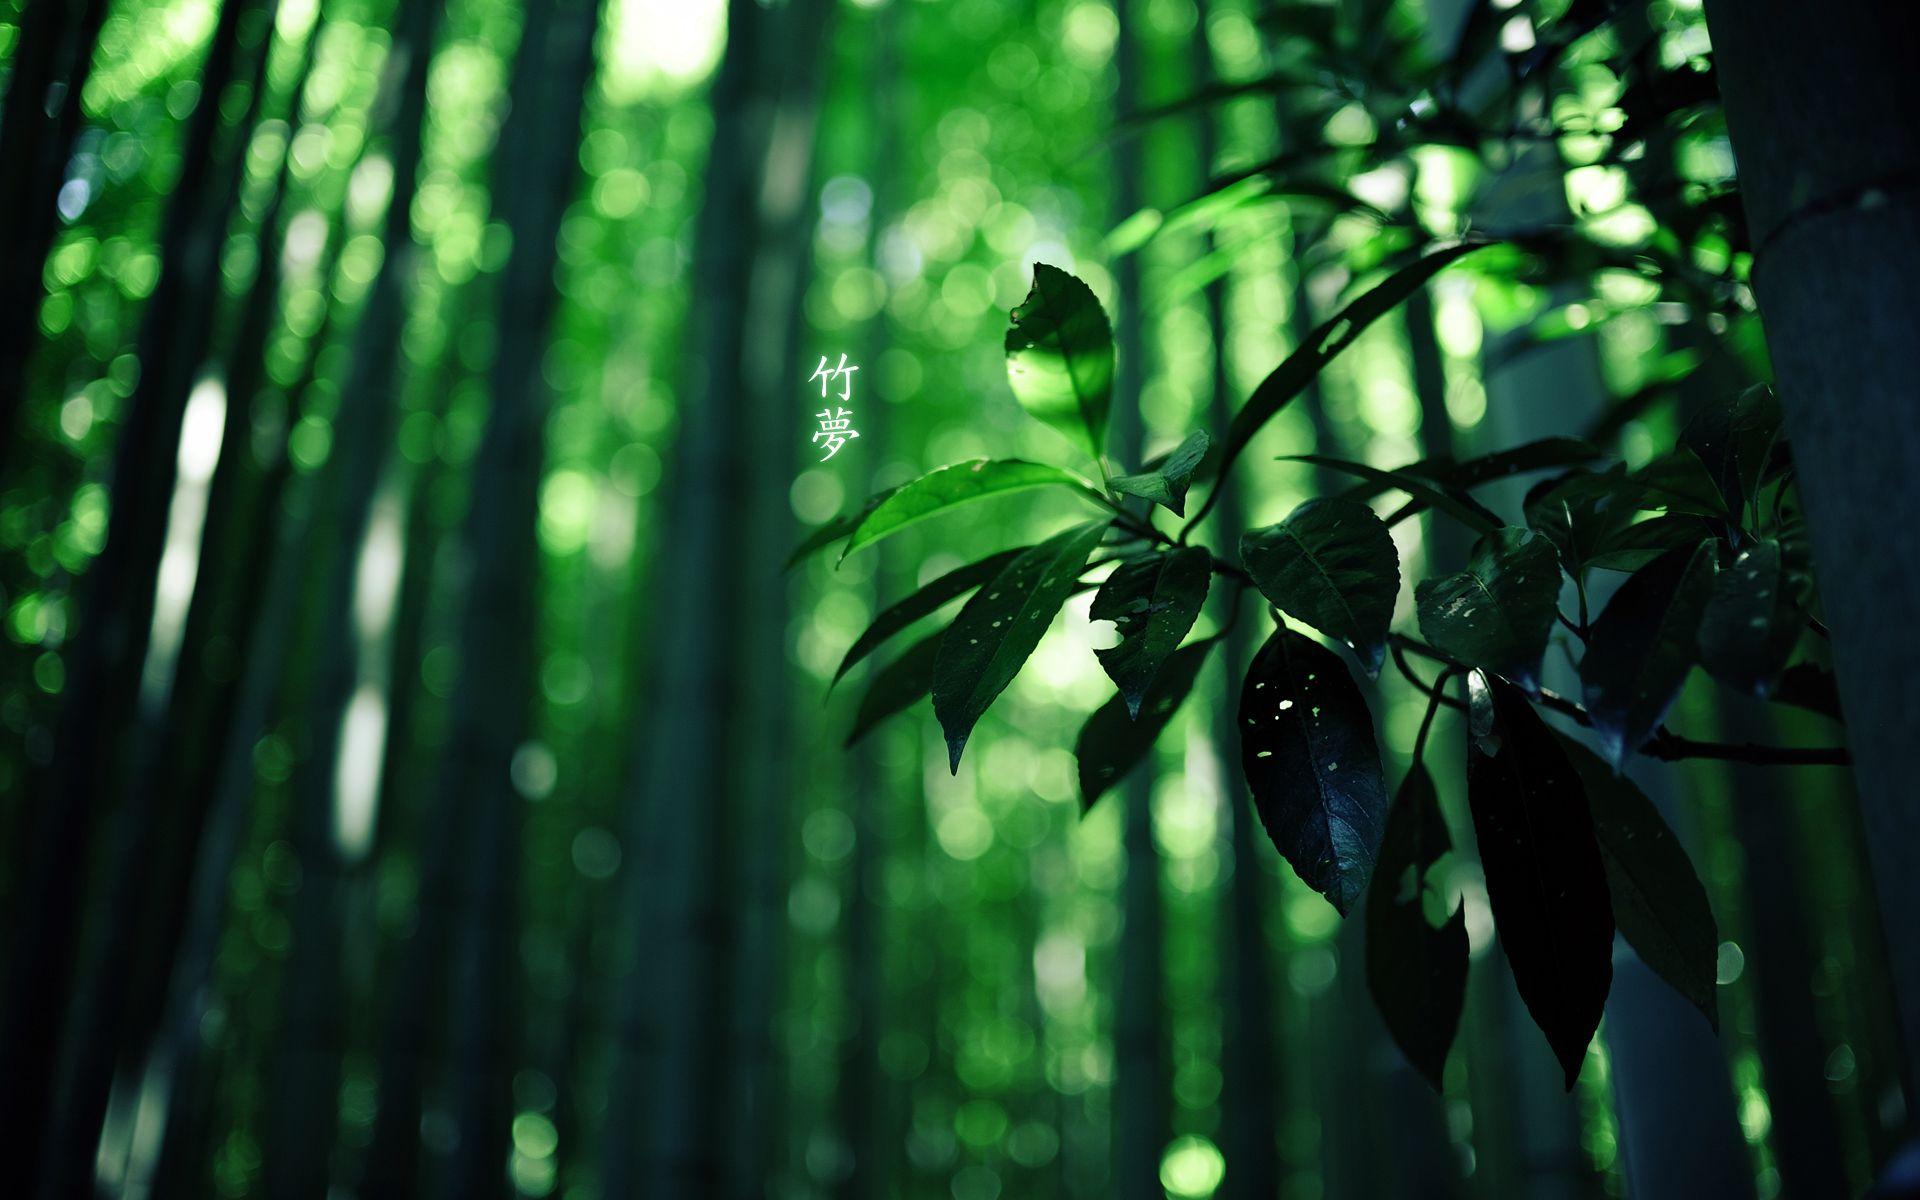 Fond D Ecran Hd Nature Foret Green Leaf Wallpaper Leaf Photography Forest Wallpaper